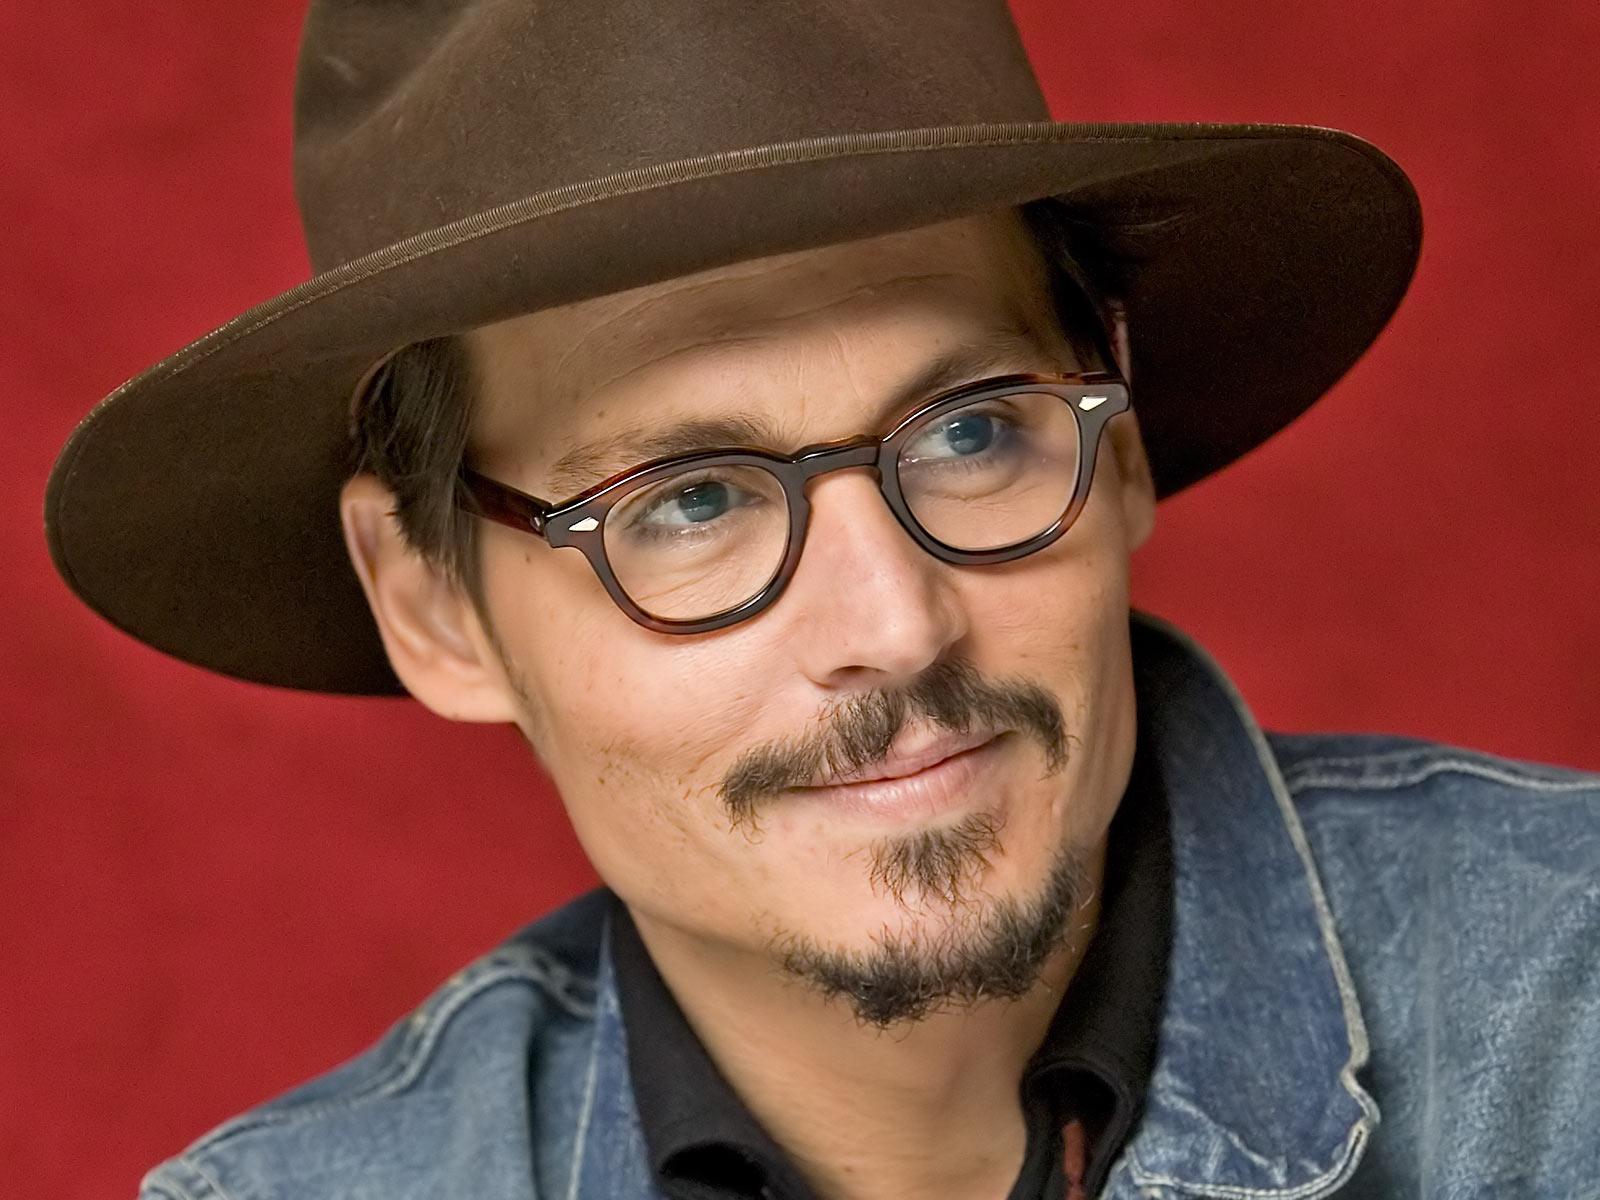 http://3.bp.blogspot.com/-k_ZQEwsmA90/TjveXEu9jqI/AAAAAAAARpQ/LsHlXi-DdAU/s1600/Johnny_Depp-American_actor-Wallpaper.jpg